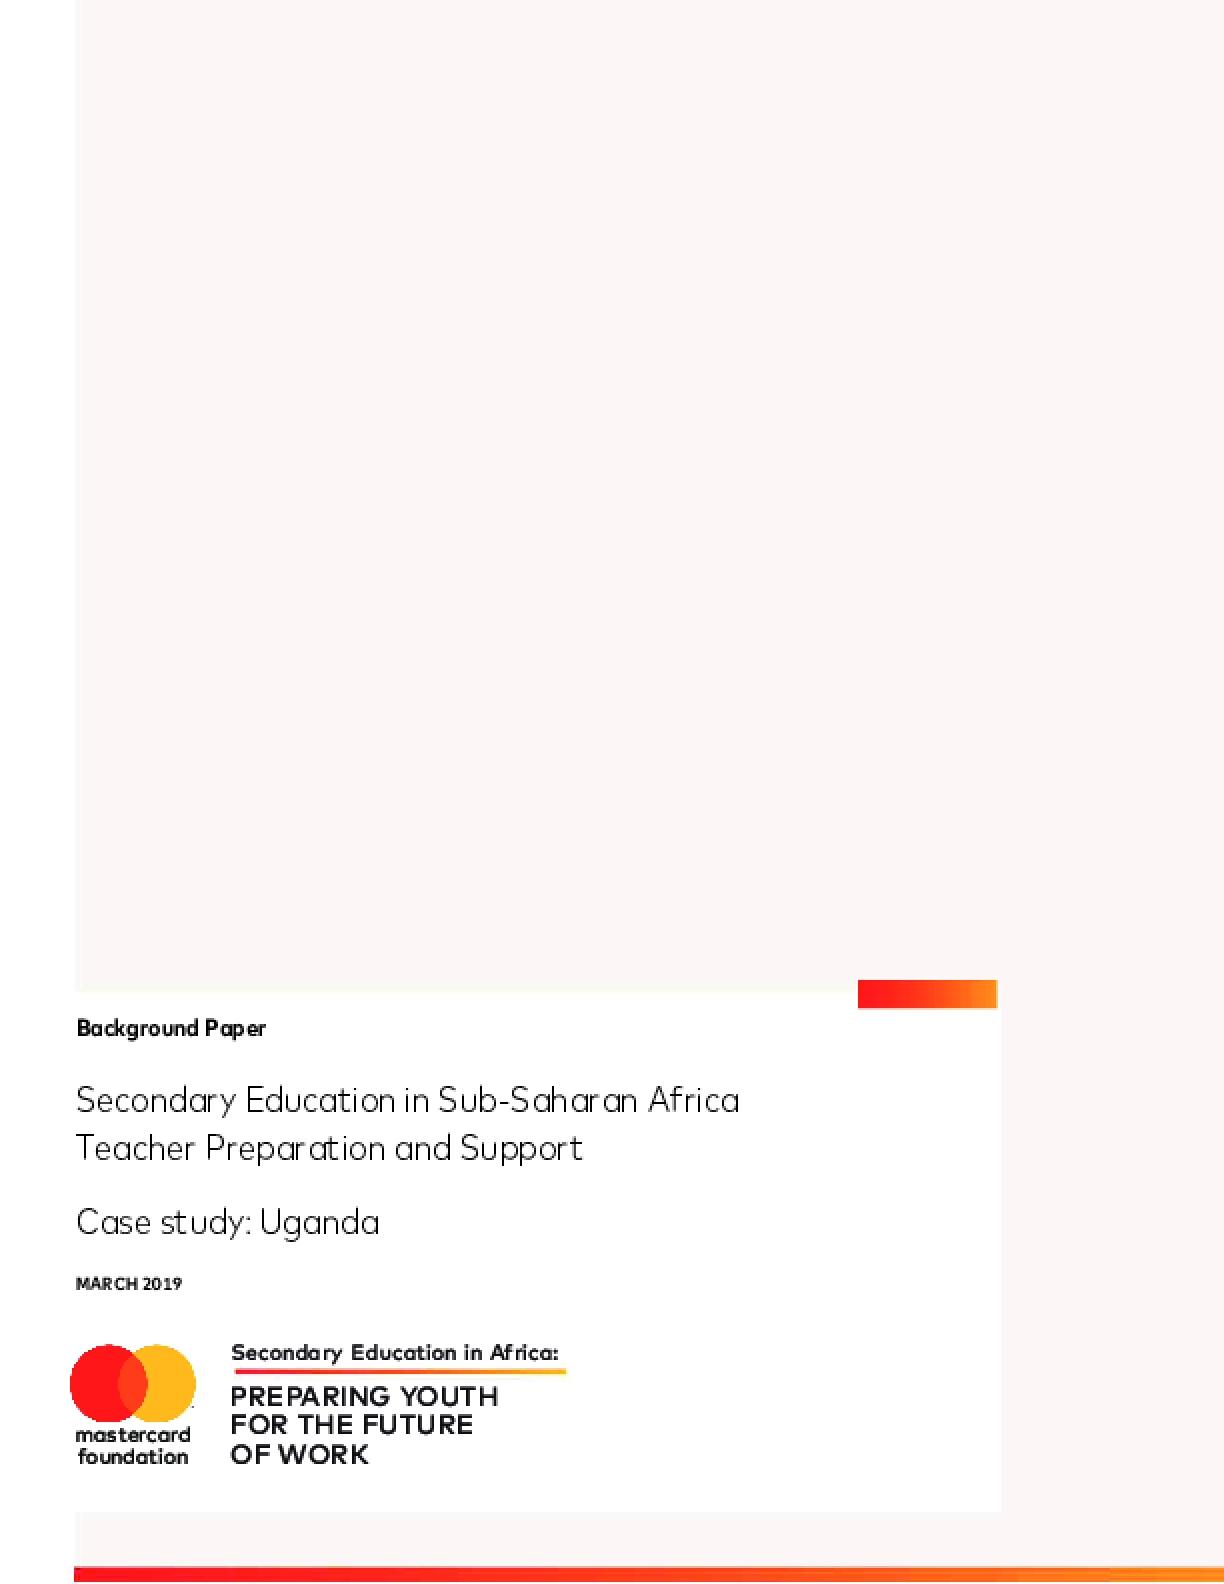 Secondary Education in Sub-Saharan Africa Teacher Preparation Deployment and Support Case Study Uganda